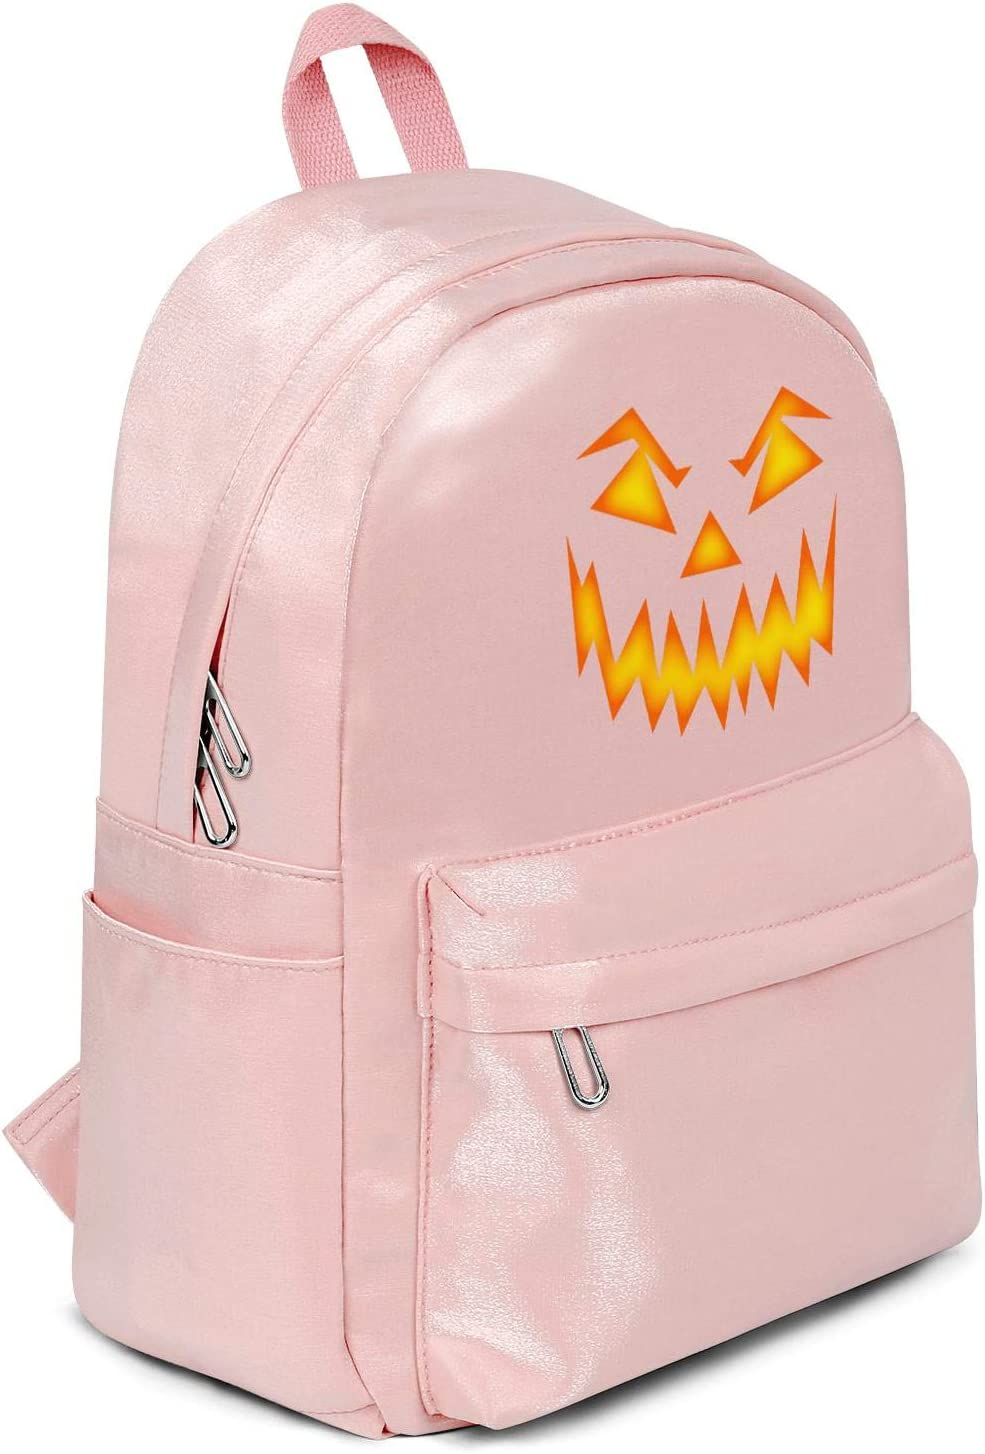 kanidjkd Unisex Backpack//Waterproof Backpack Ultralight Halloween Scary Pumpkin Facecamping Laptop Backpack for Everyday